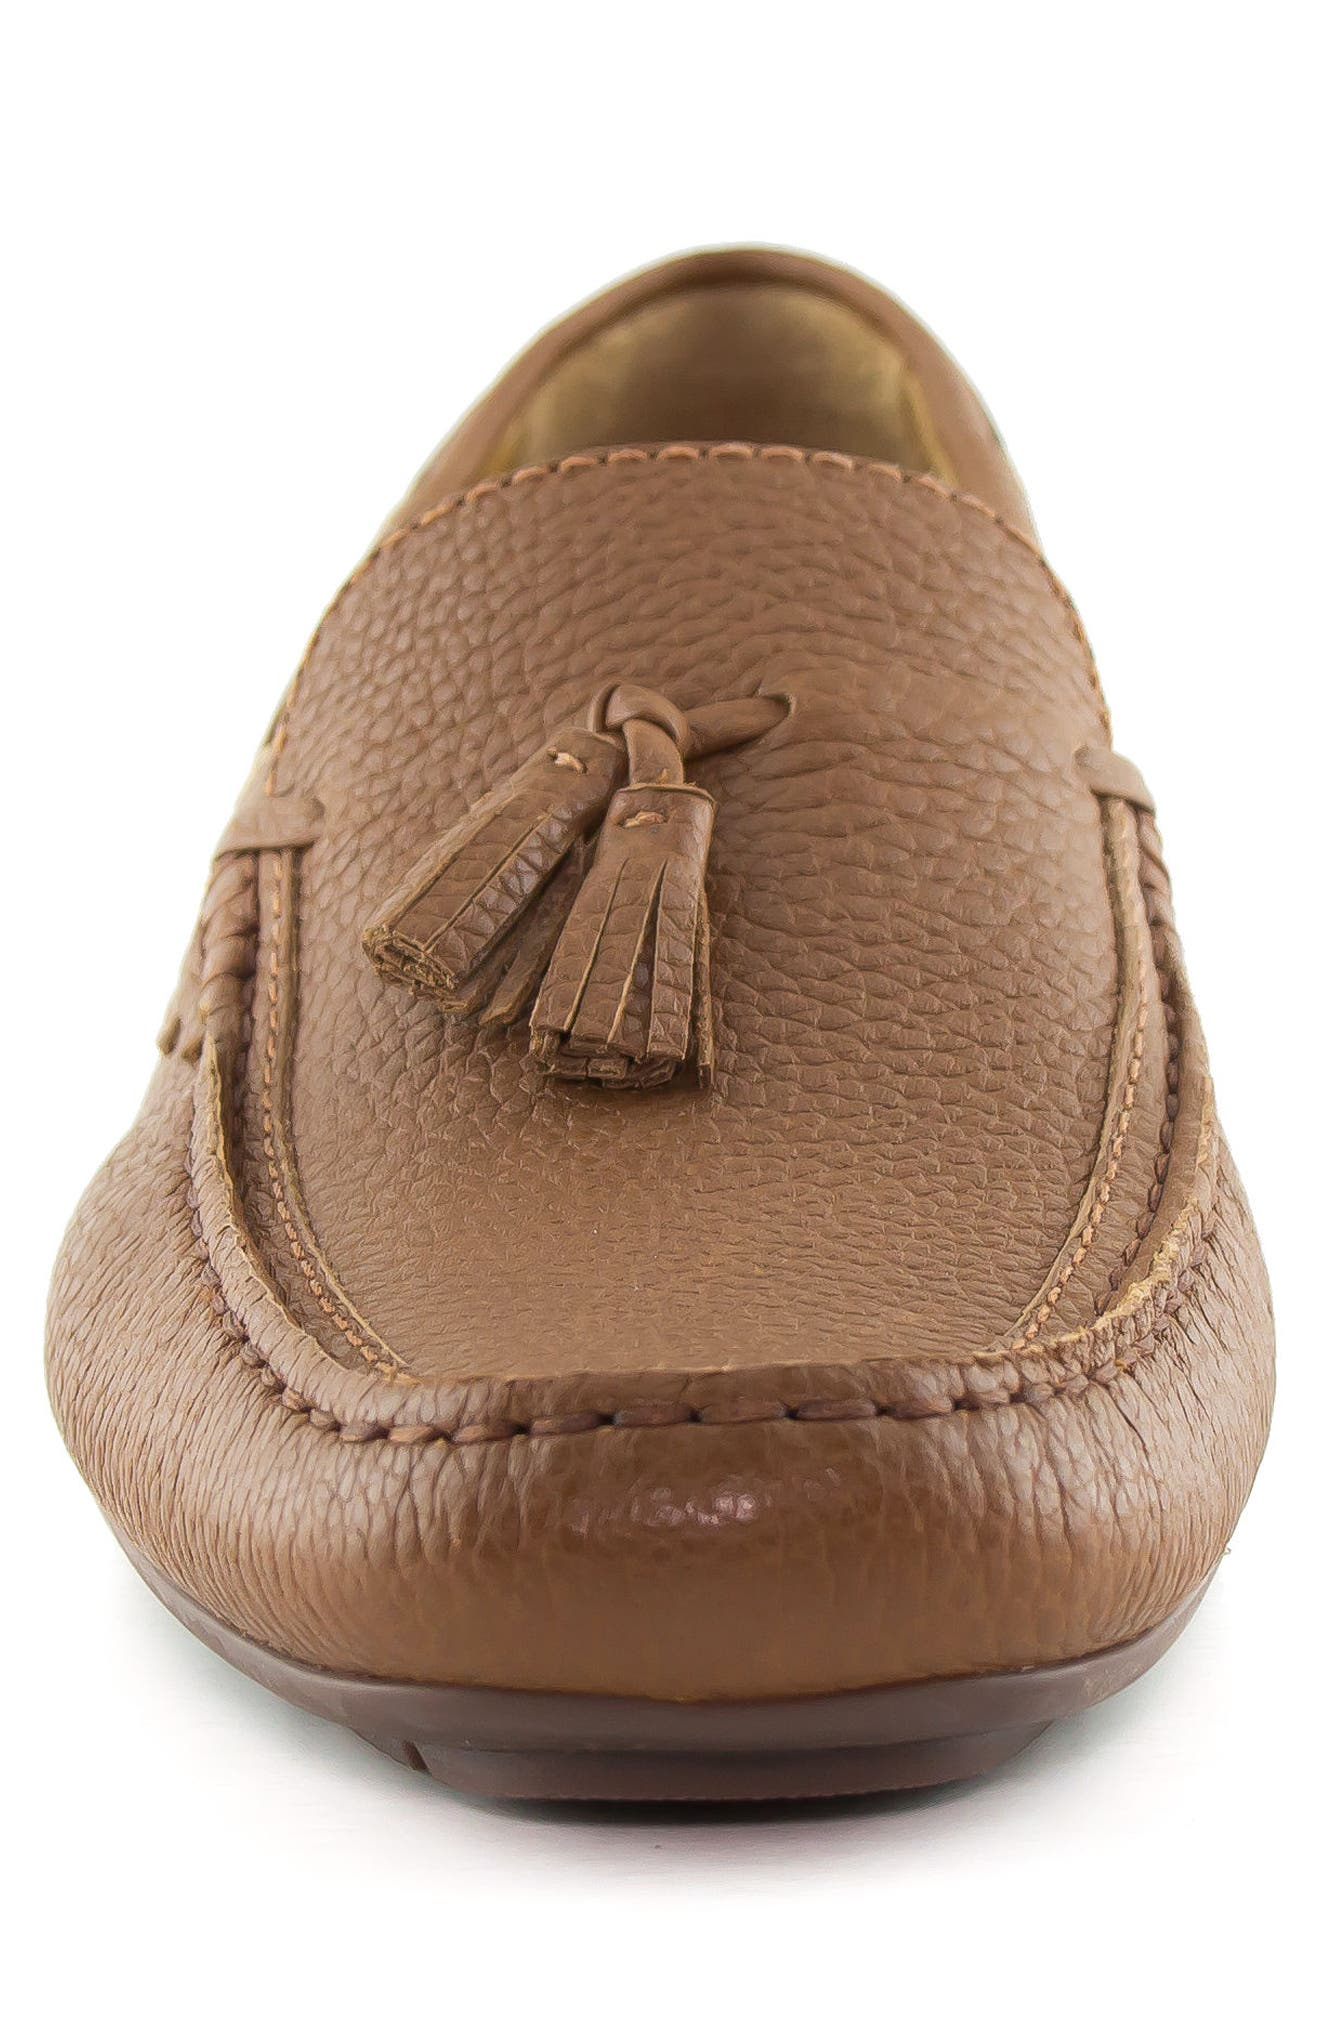 Bushwick Tasseled Driving Loafer,                             Alternate thumbnail 4, color,                             Cognac